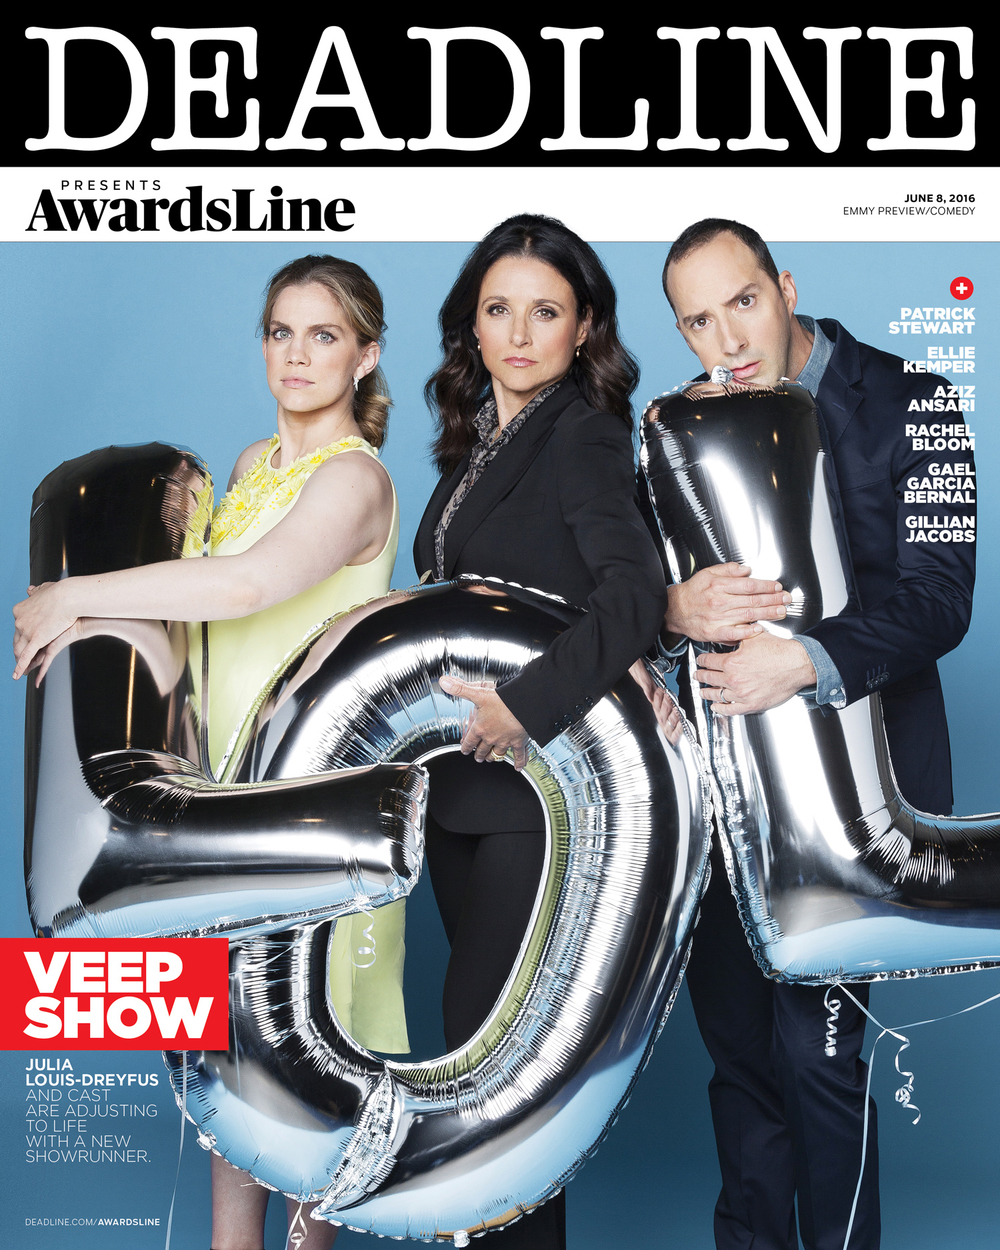 Awardsline Magazine, Veep